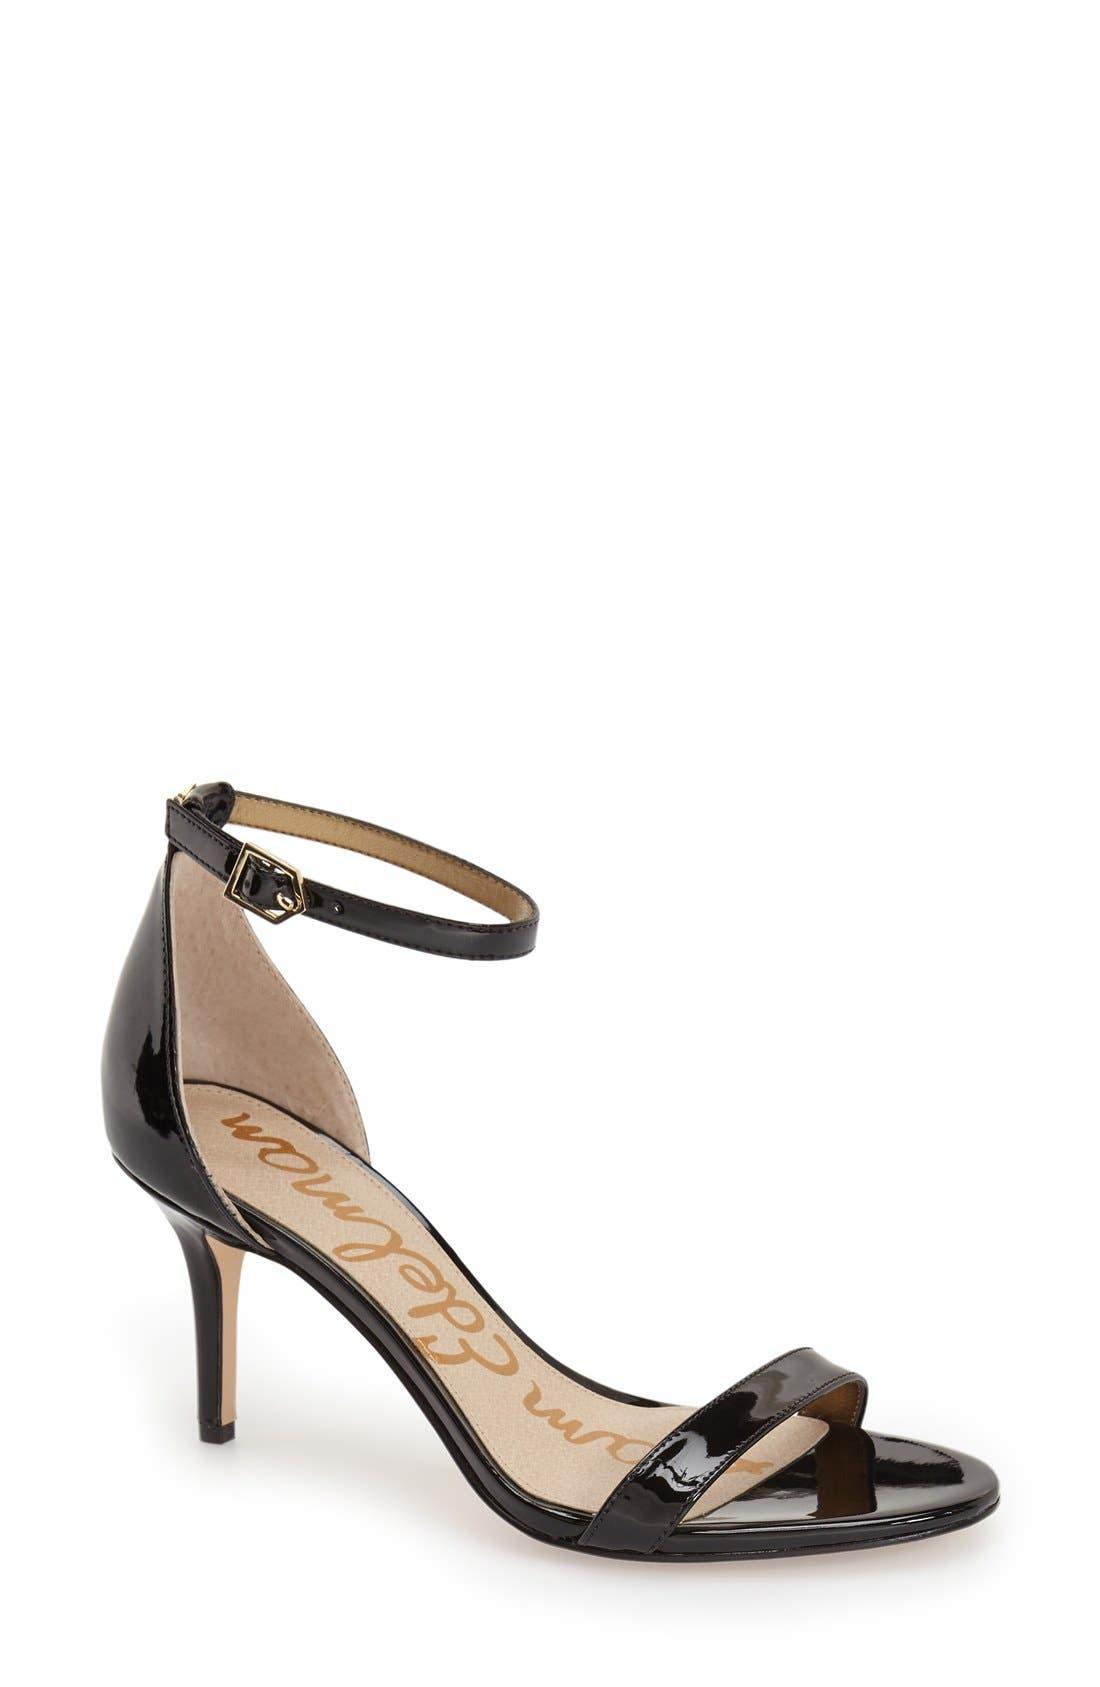 strappy sandal heels | Nordstrom